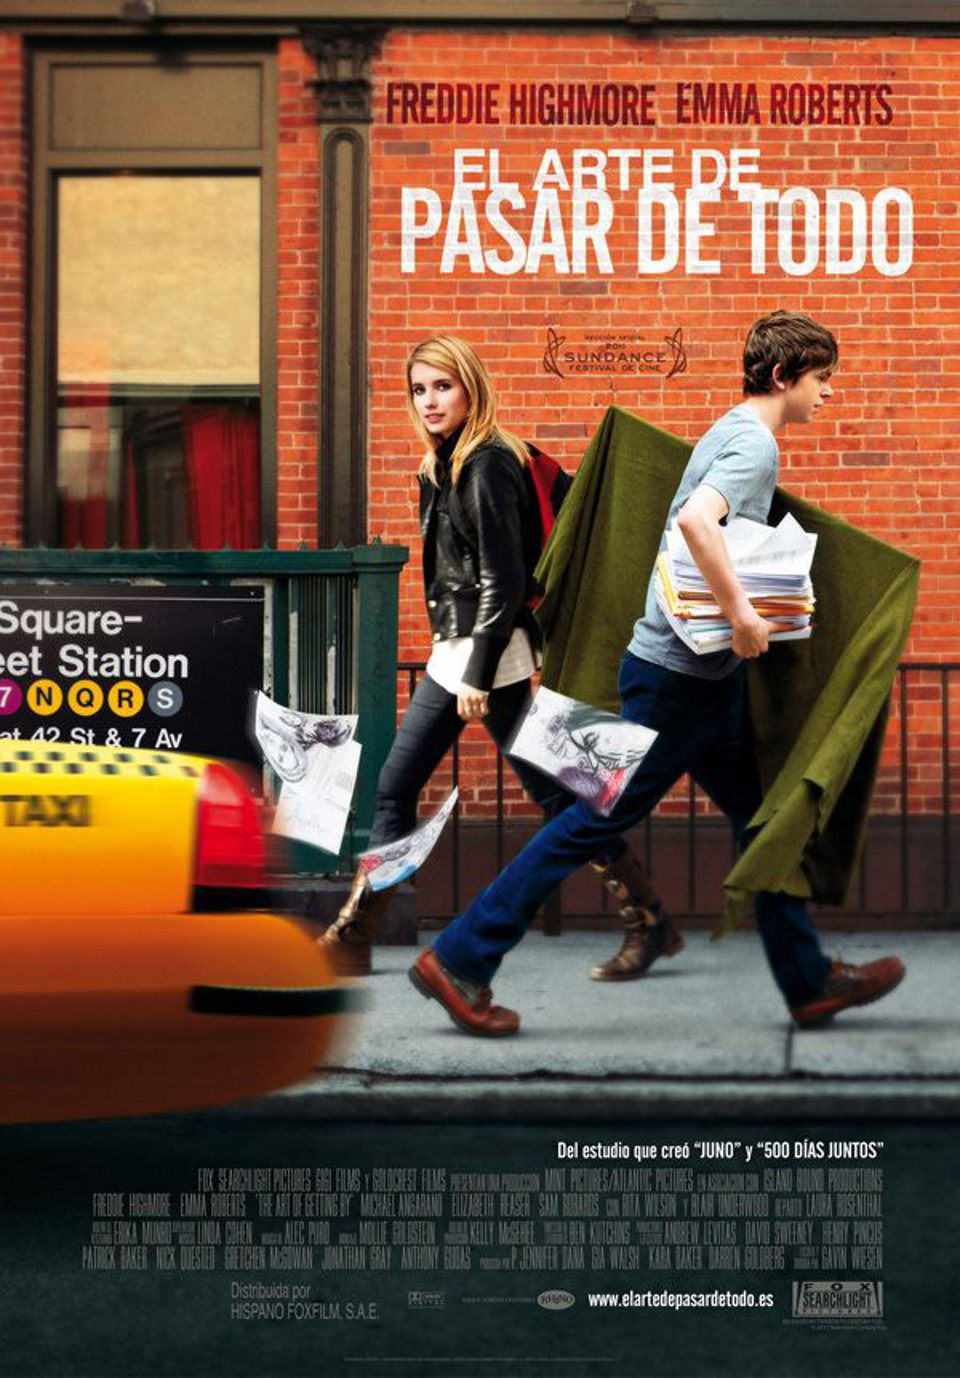 http://www.ecartelera.com/carteles/4400/4448/001-el-arte-de-pasar-de-todo-espana.jpg